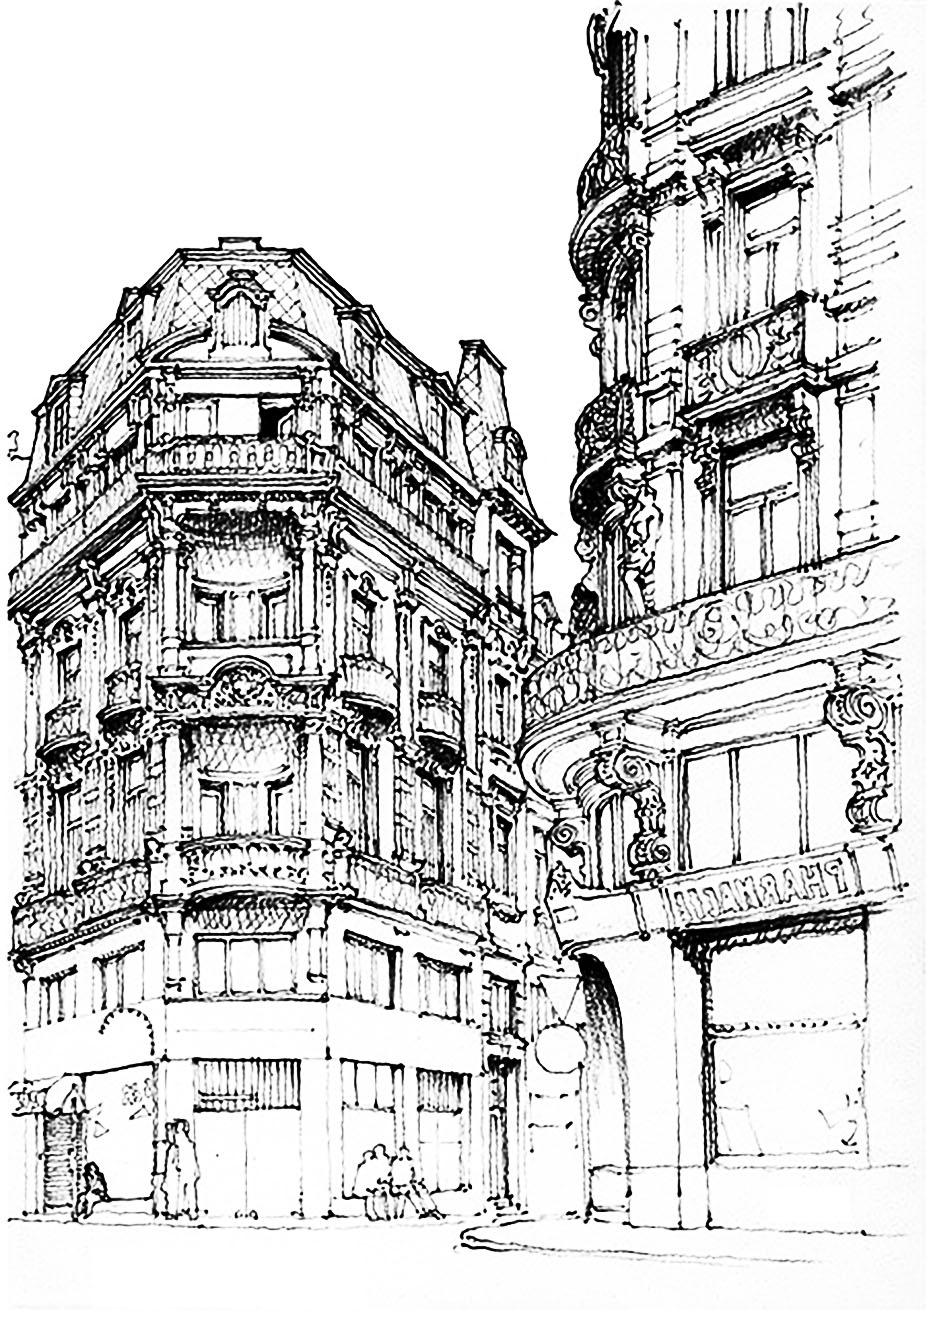 Dessin d une rue de Paris